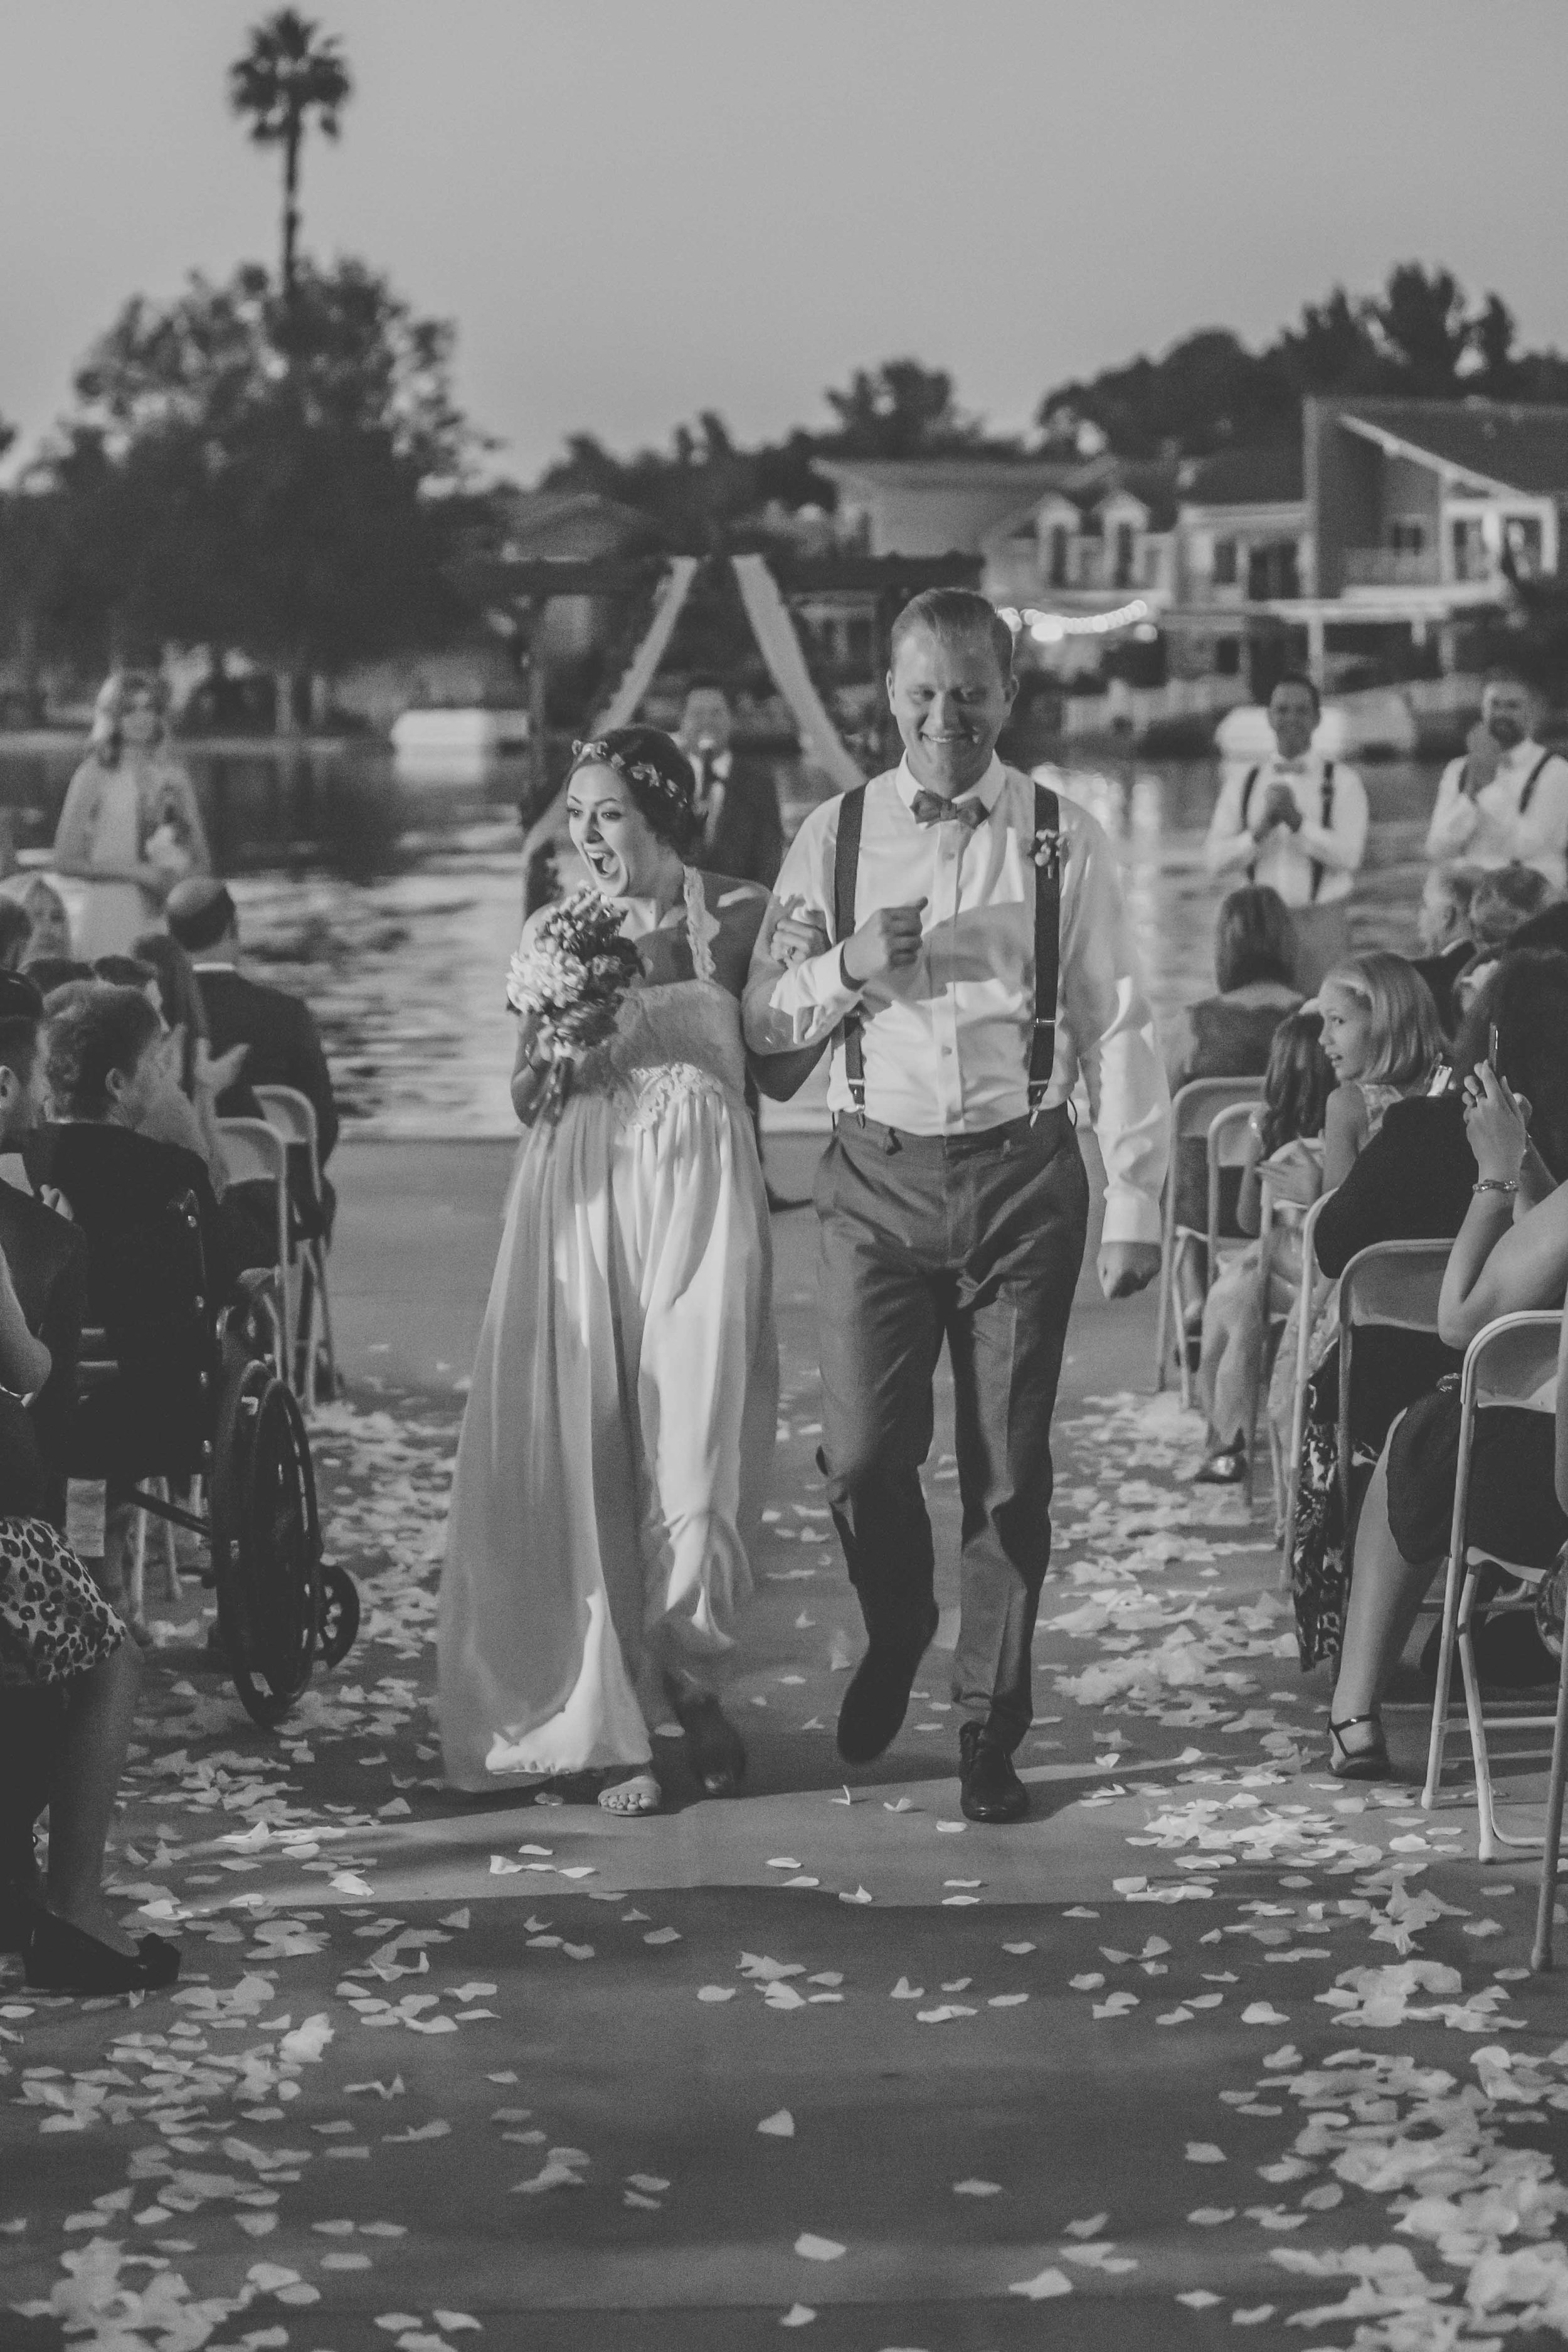 20141024-DePartee-Wedding-APavone-052-sm.jpg